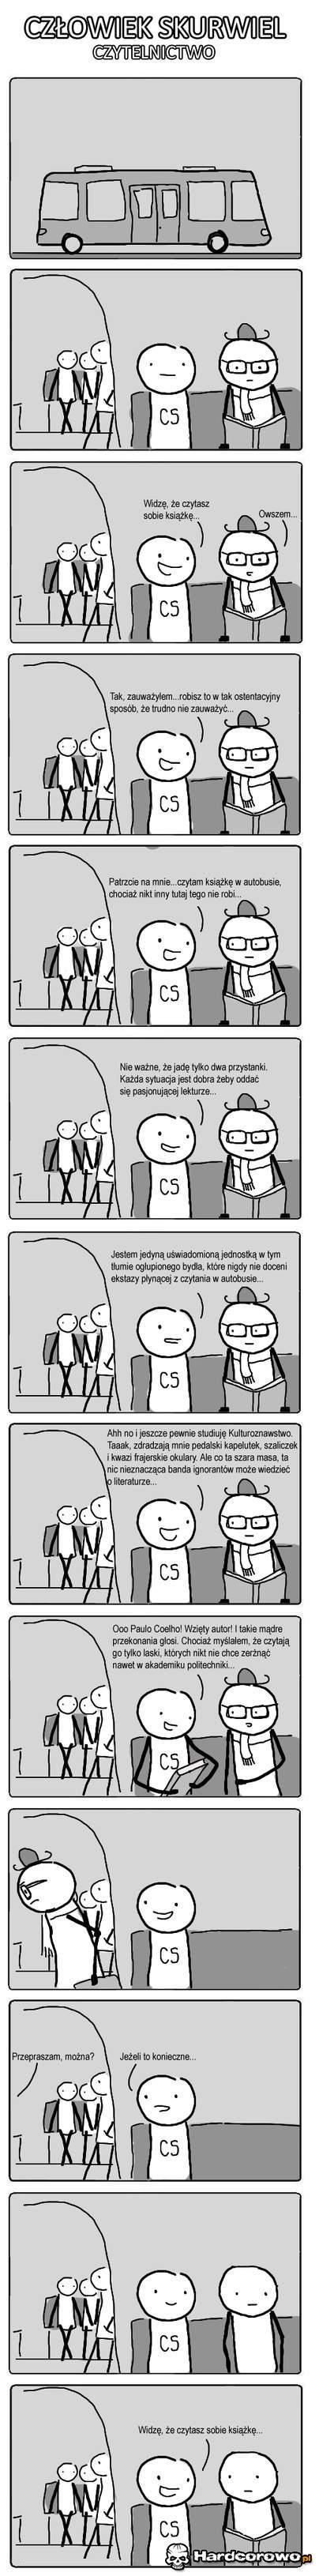 Czytelnictwo - 1